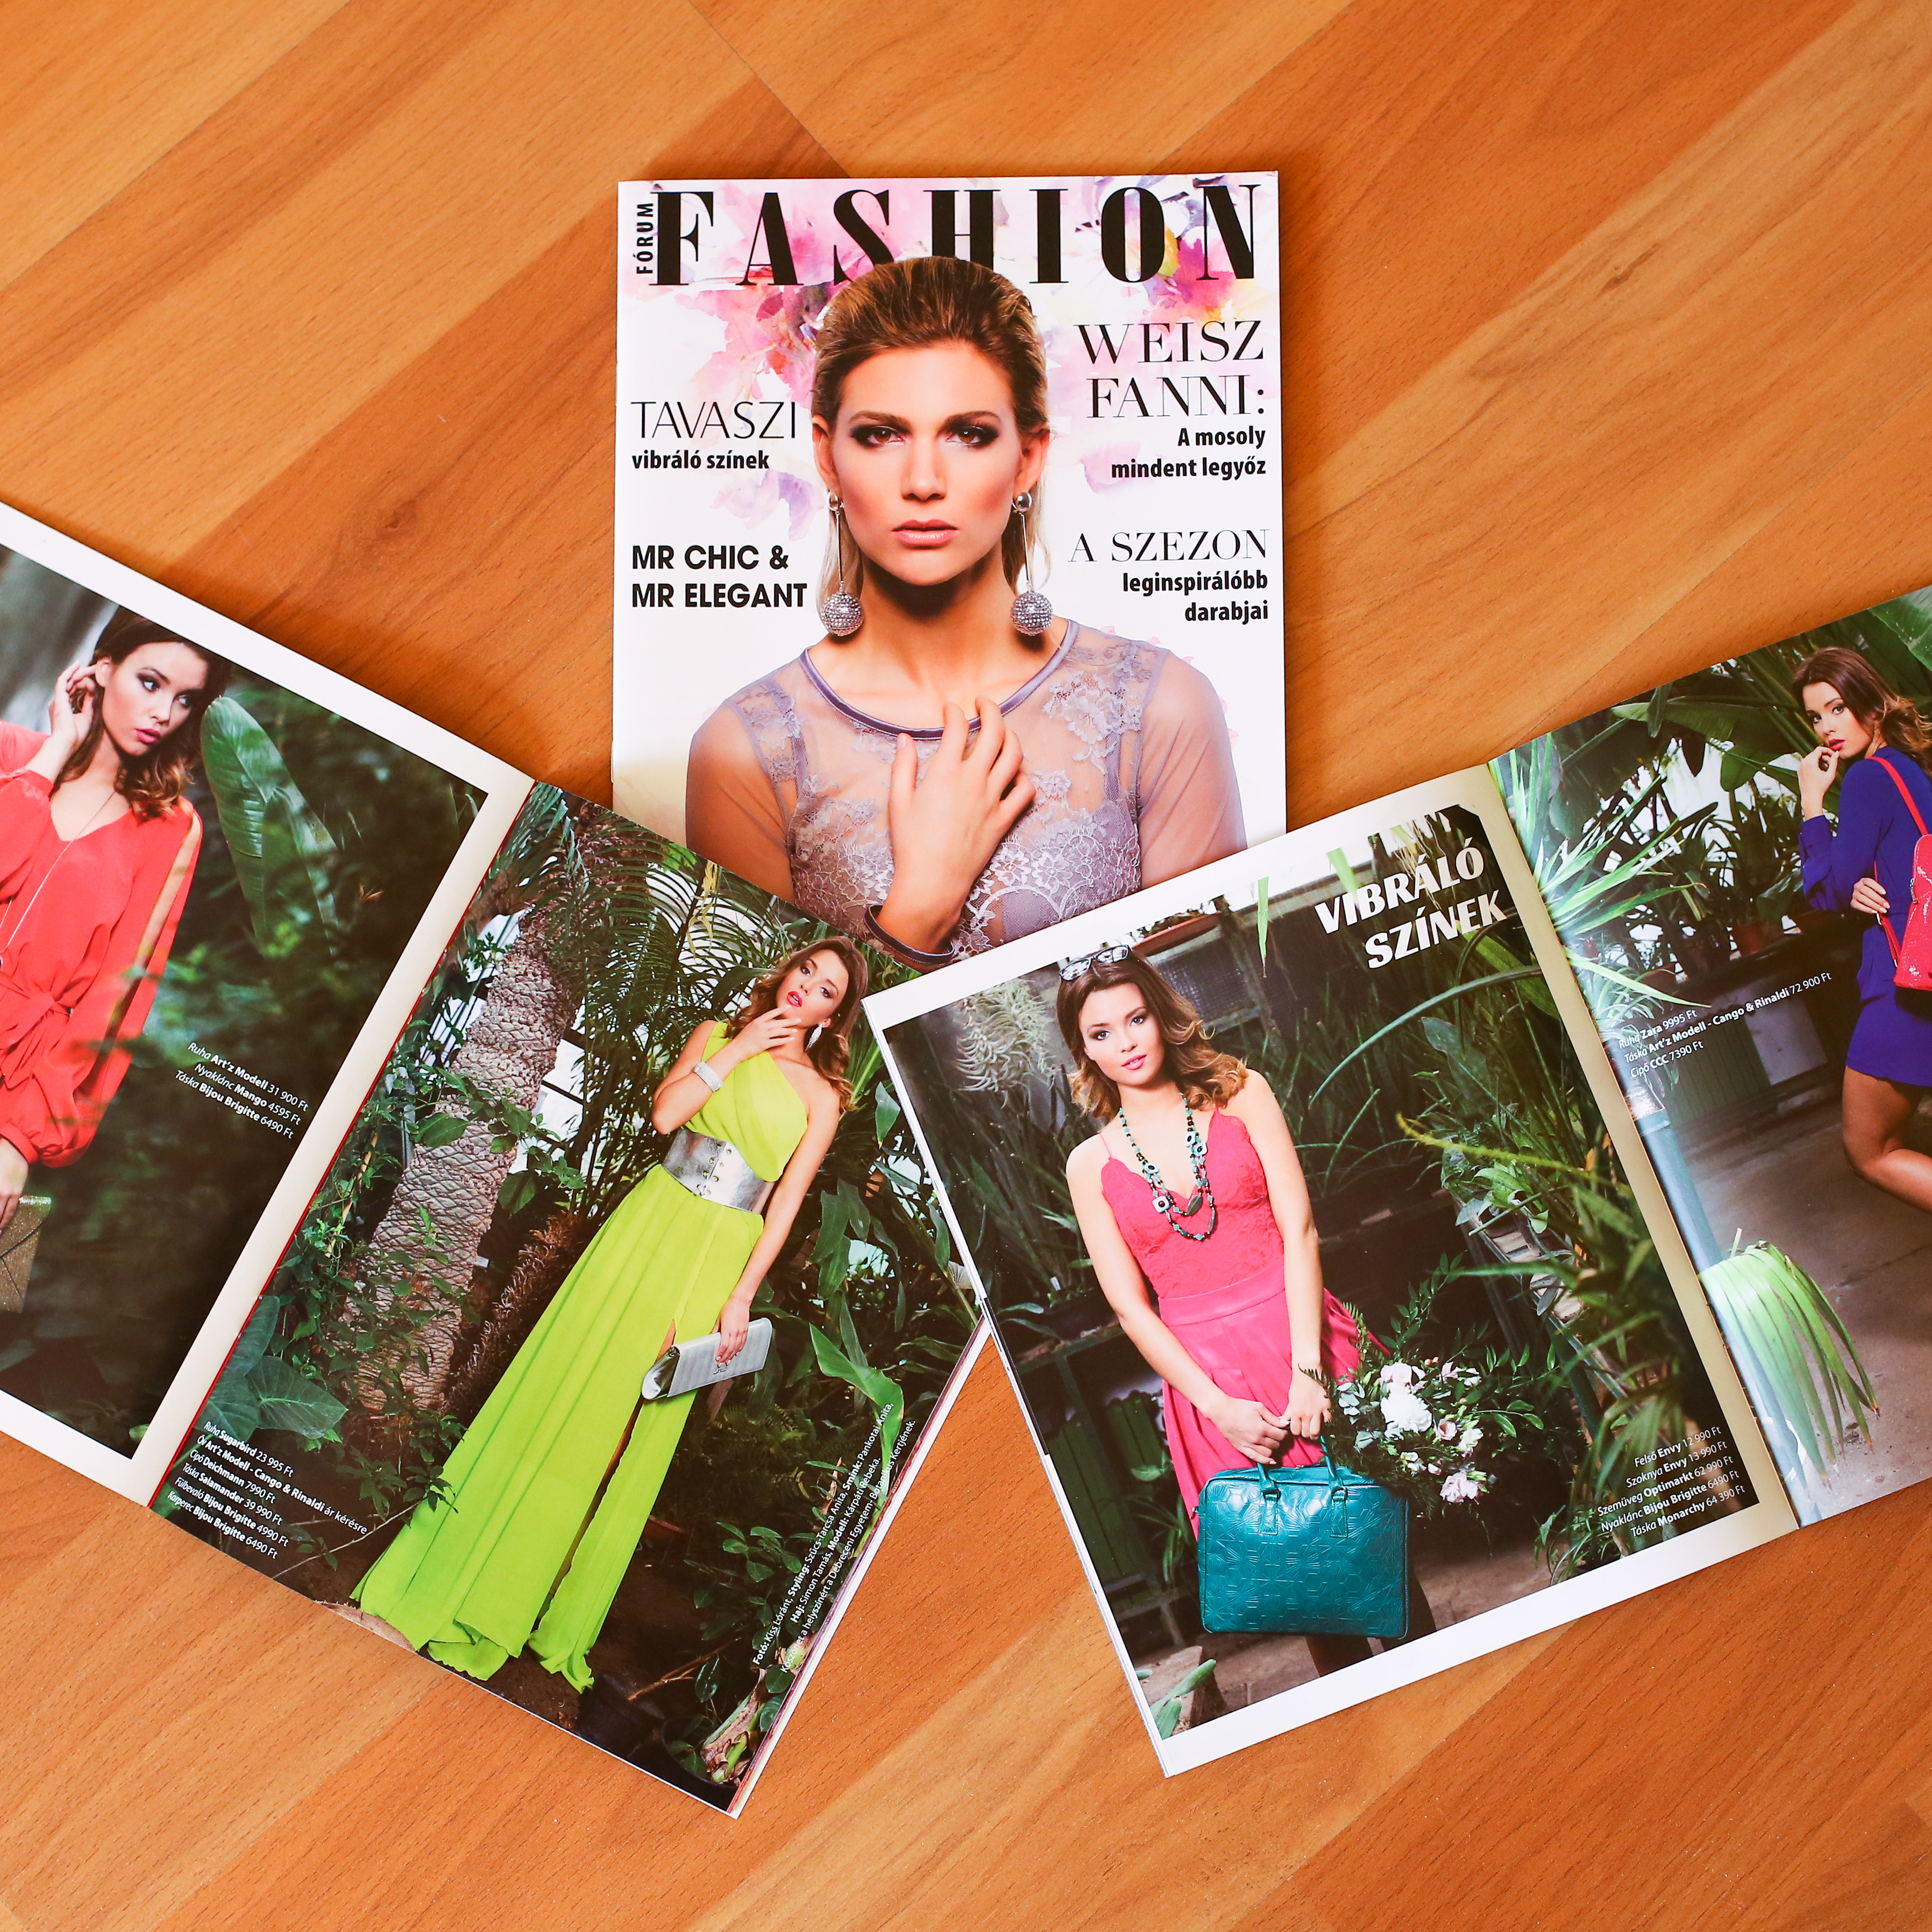 Fórum Fashion magazin